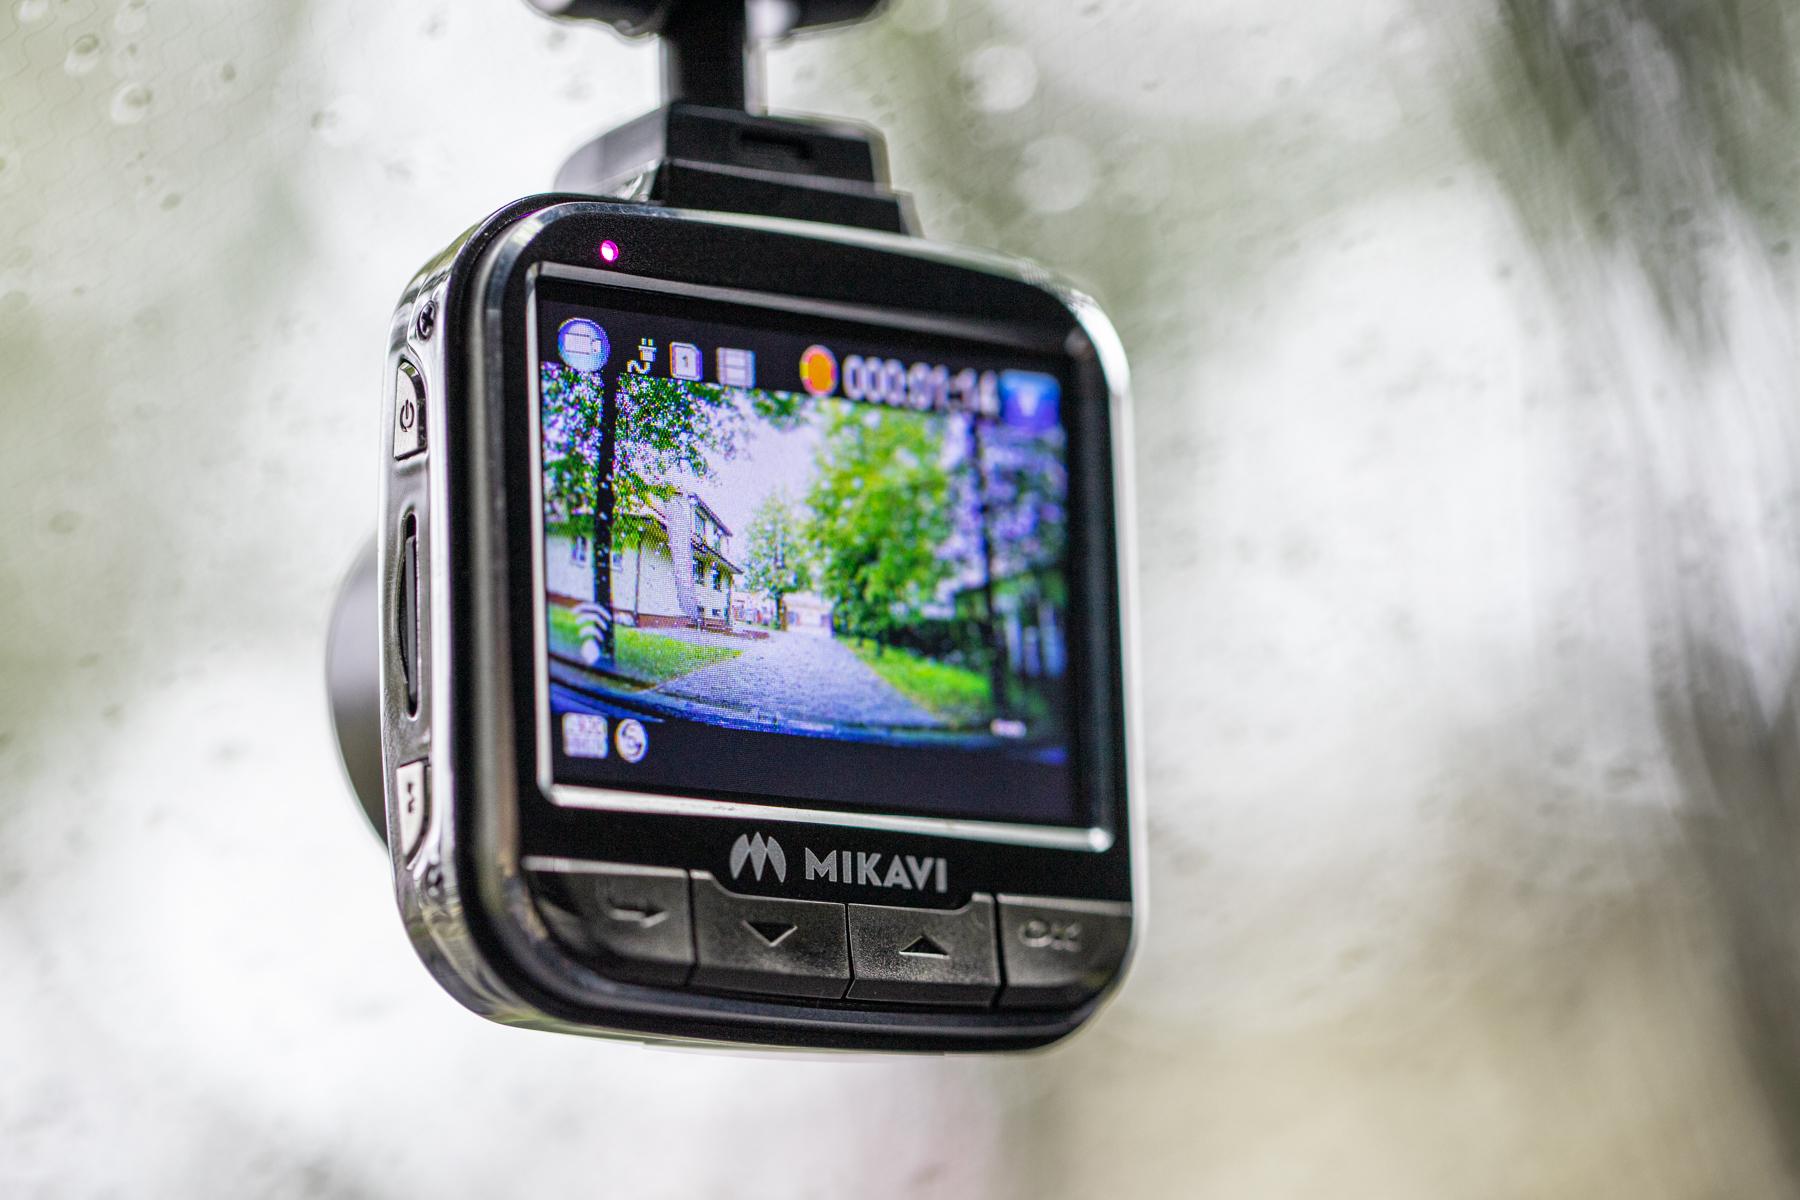 Mikavi wideorejestrator kamera samochodowa (15)